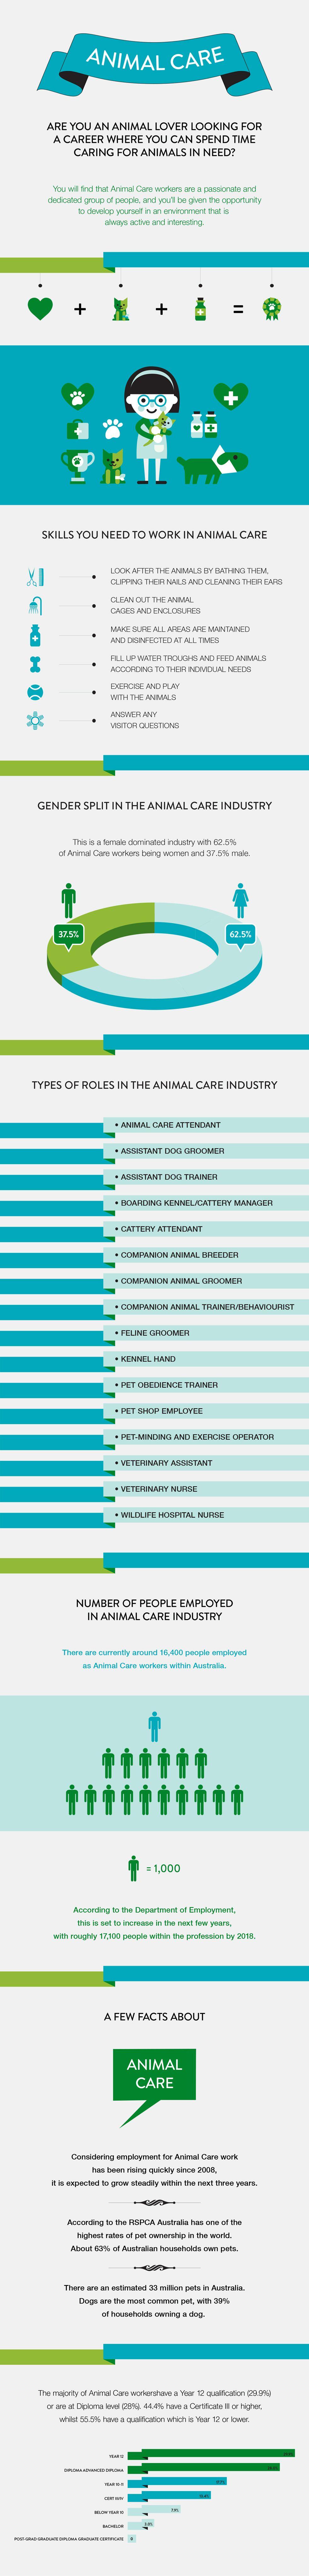 animal_care_infographic-compressor